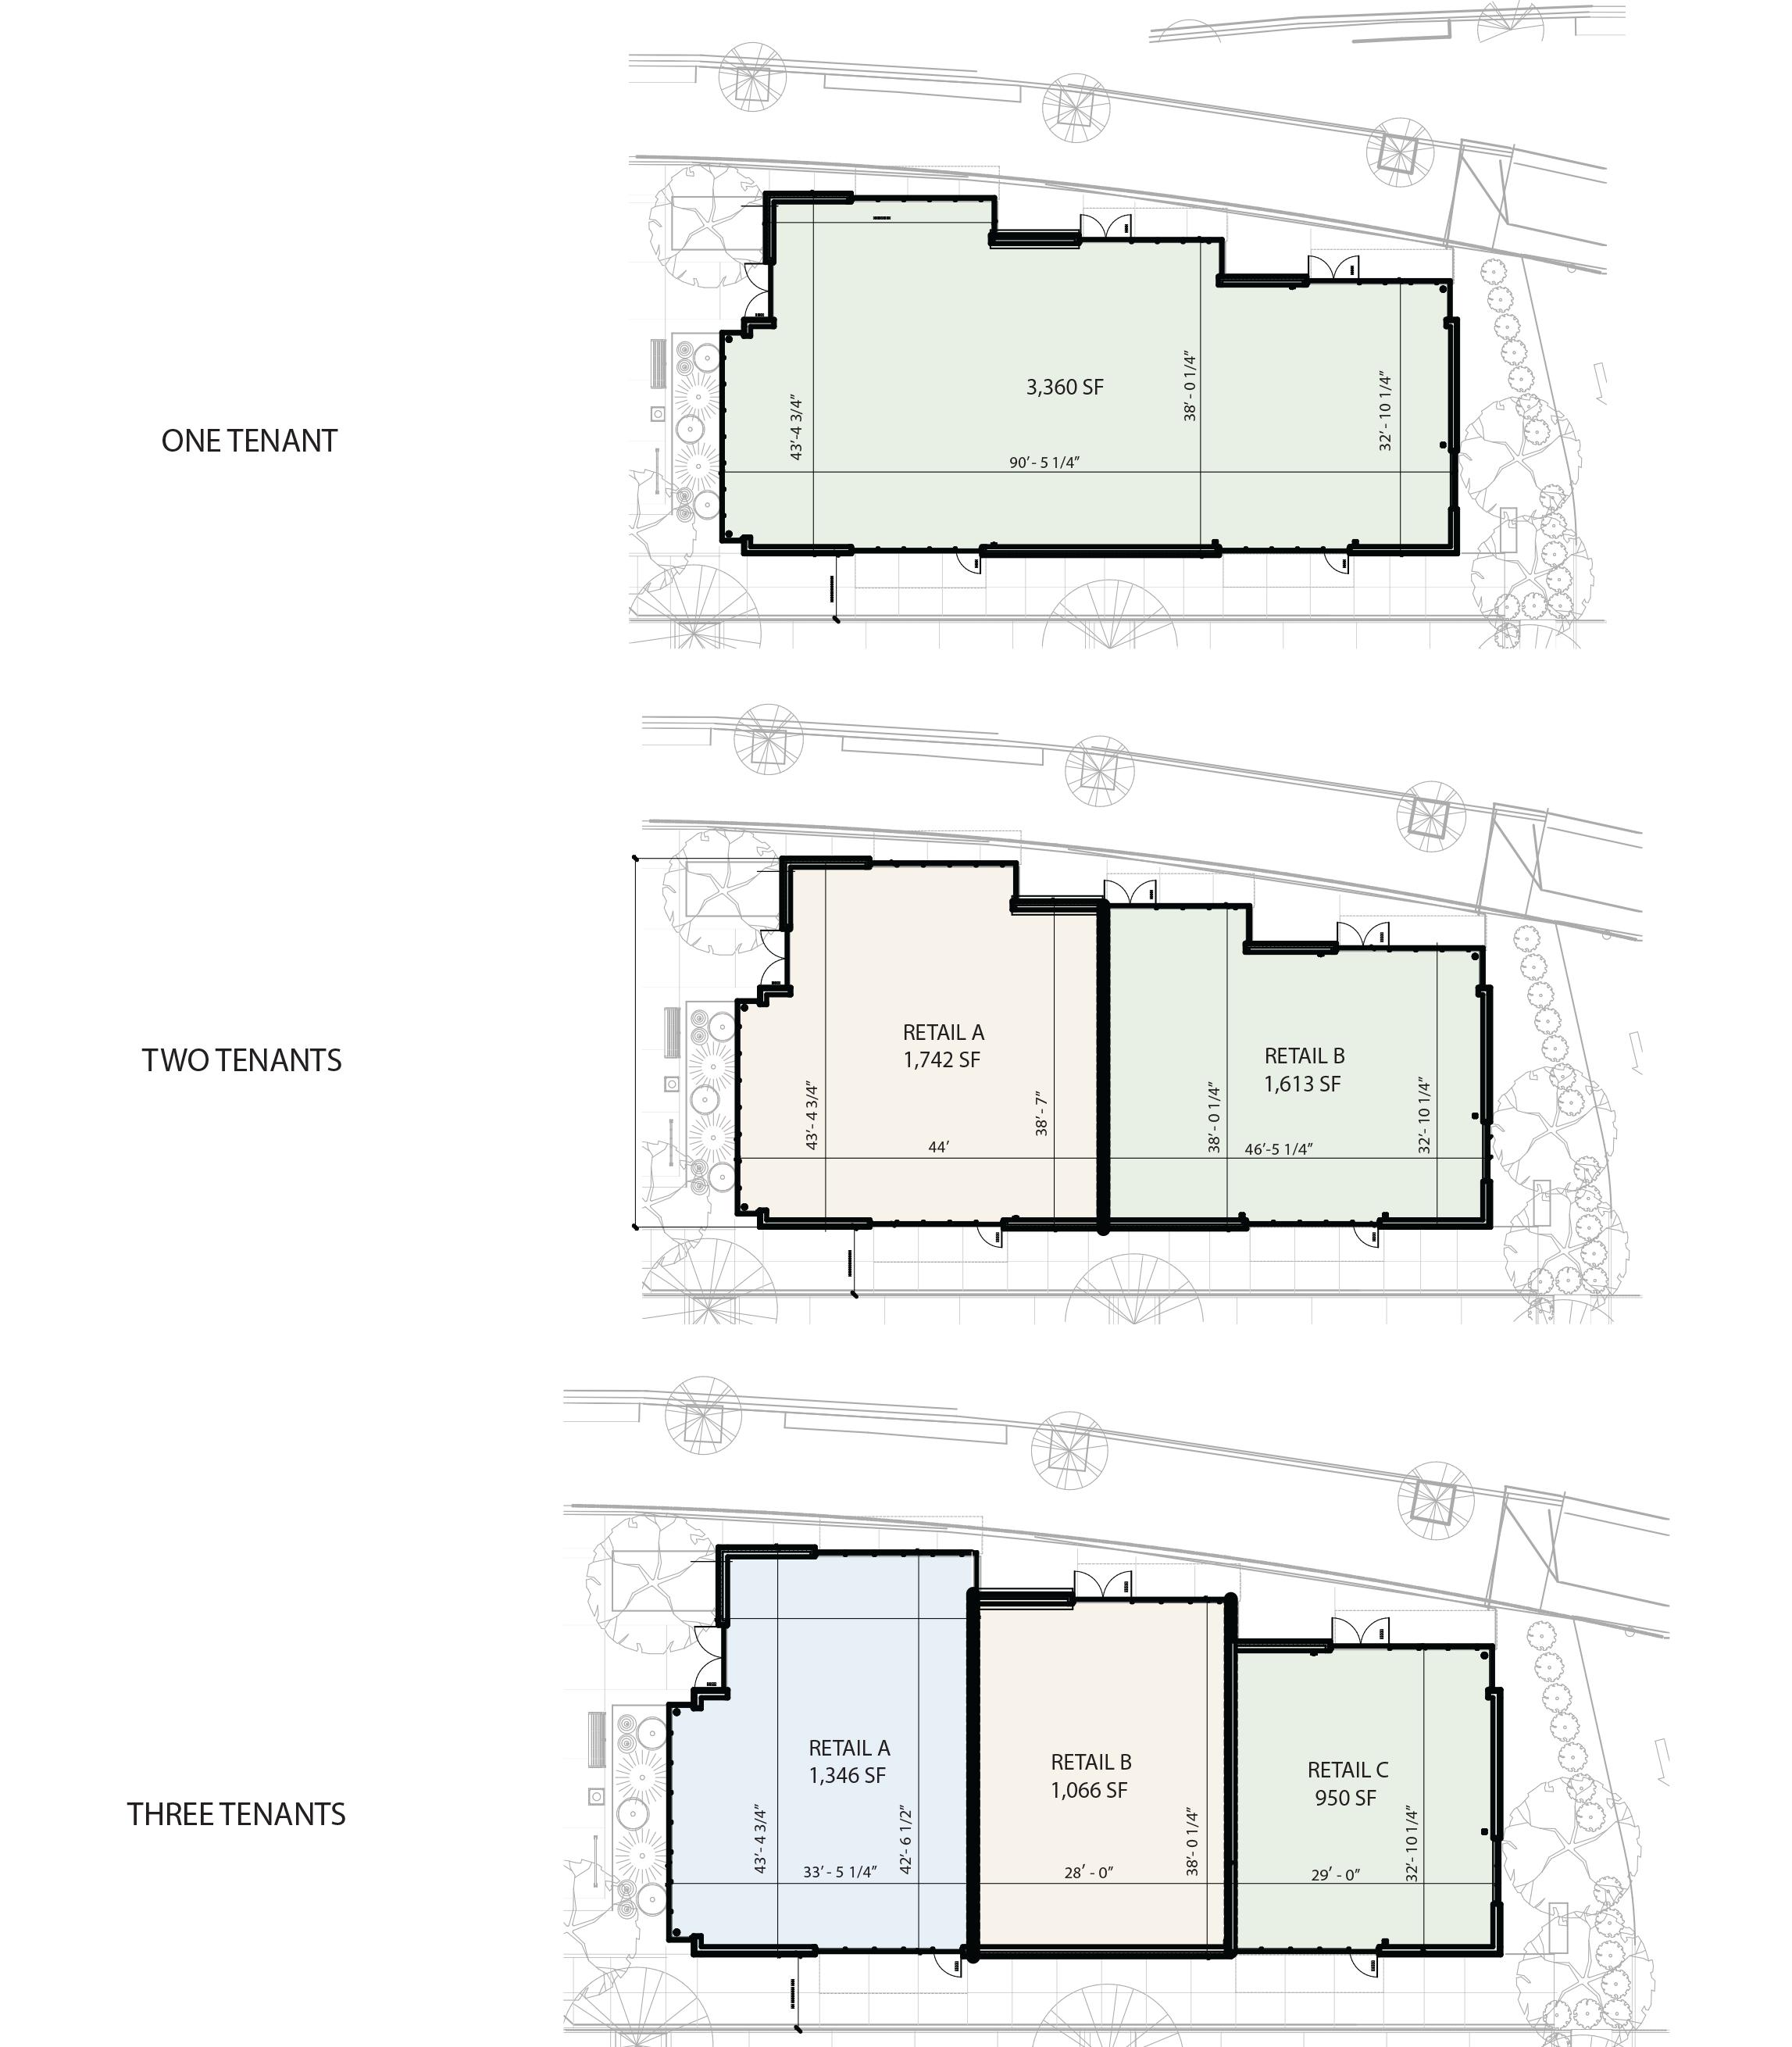 Layout options (north) -